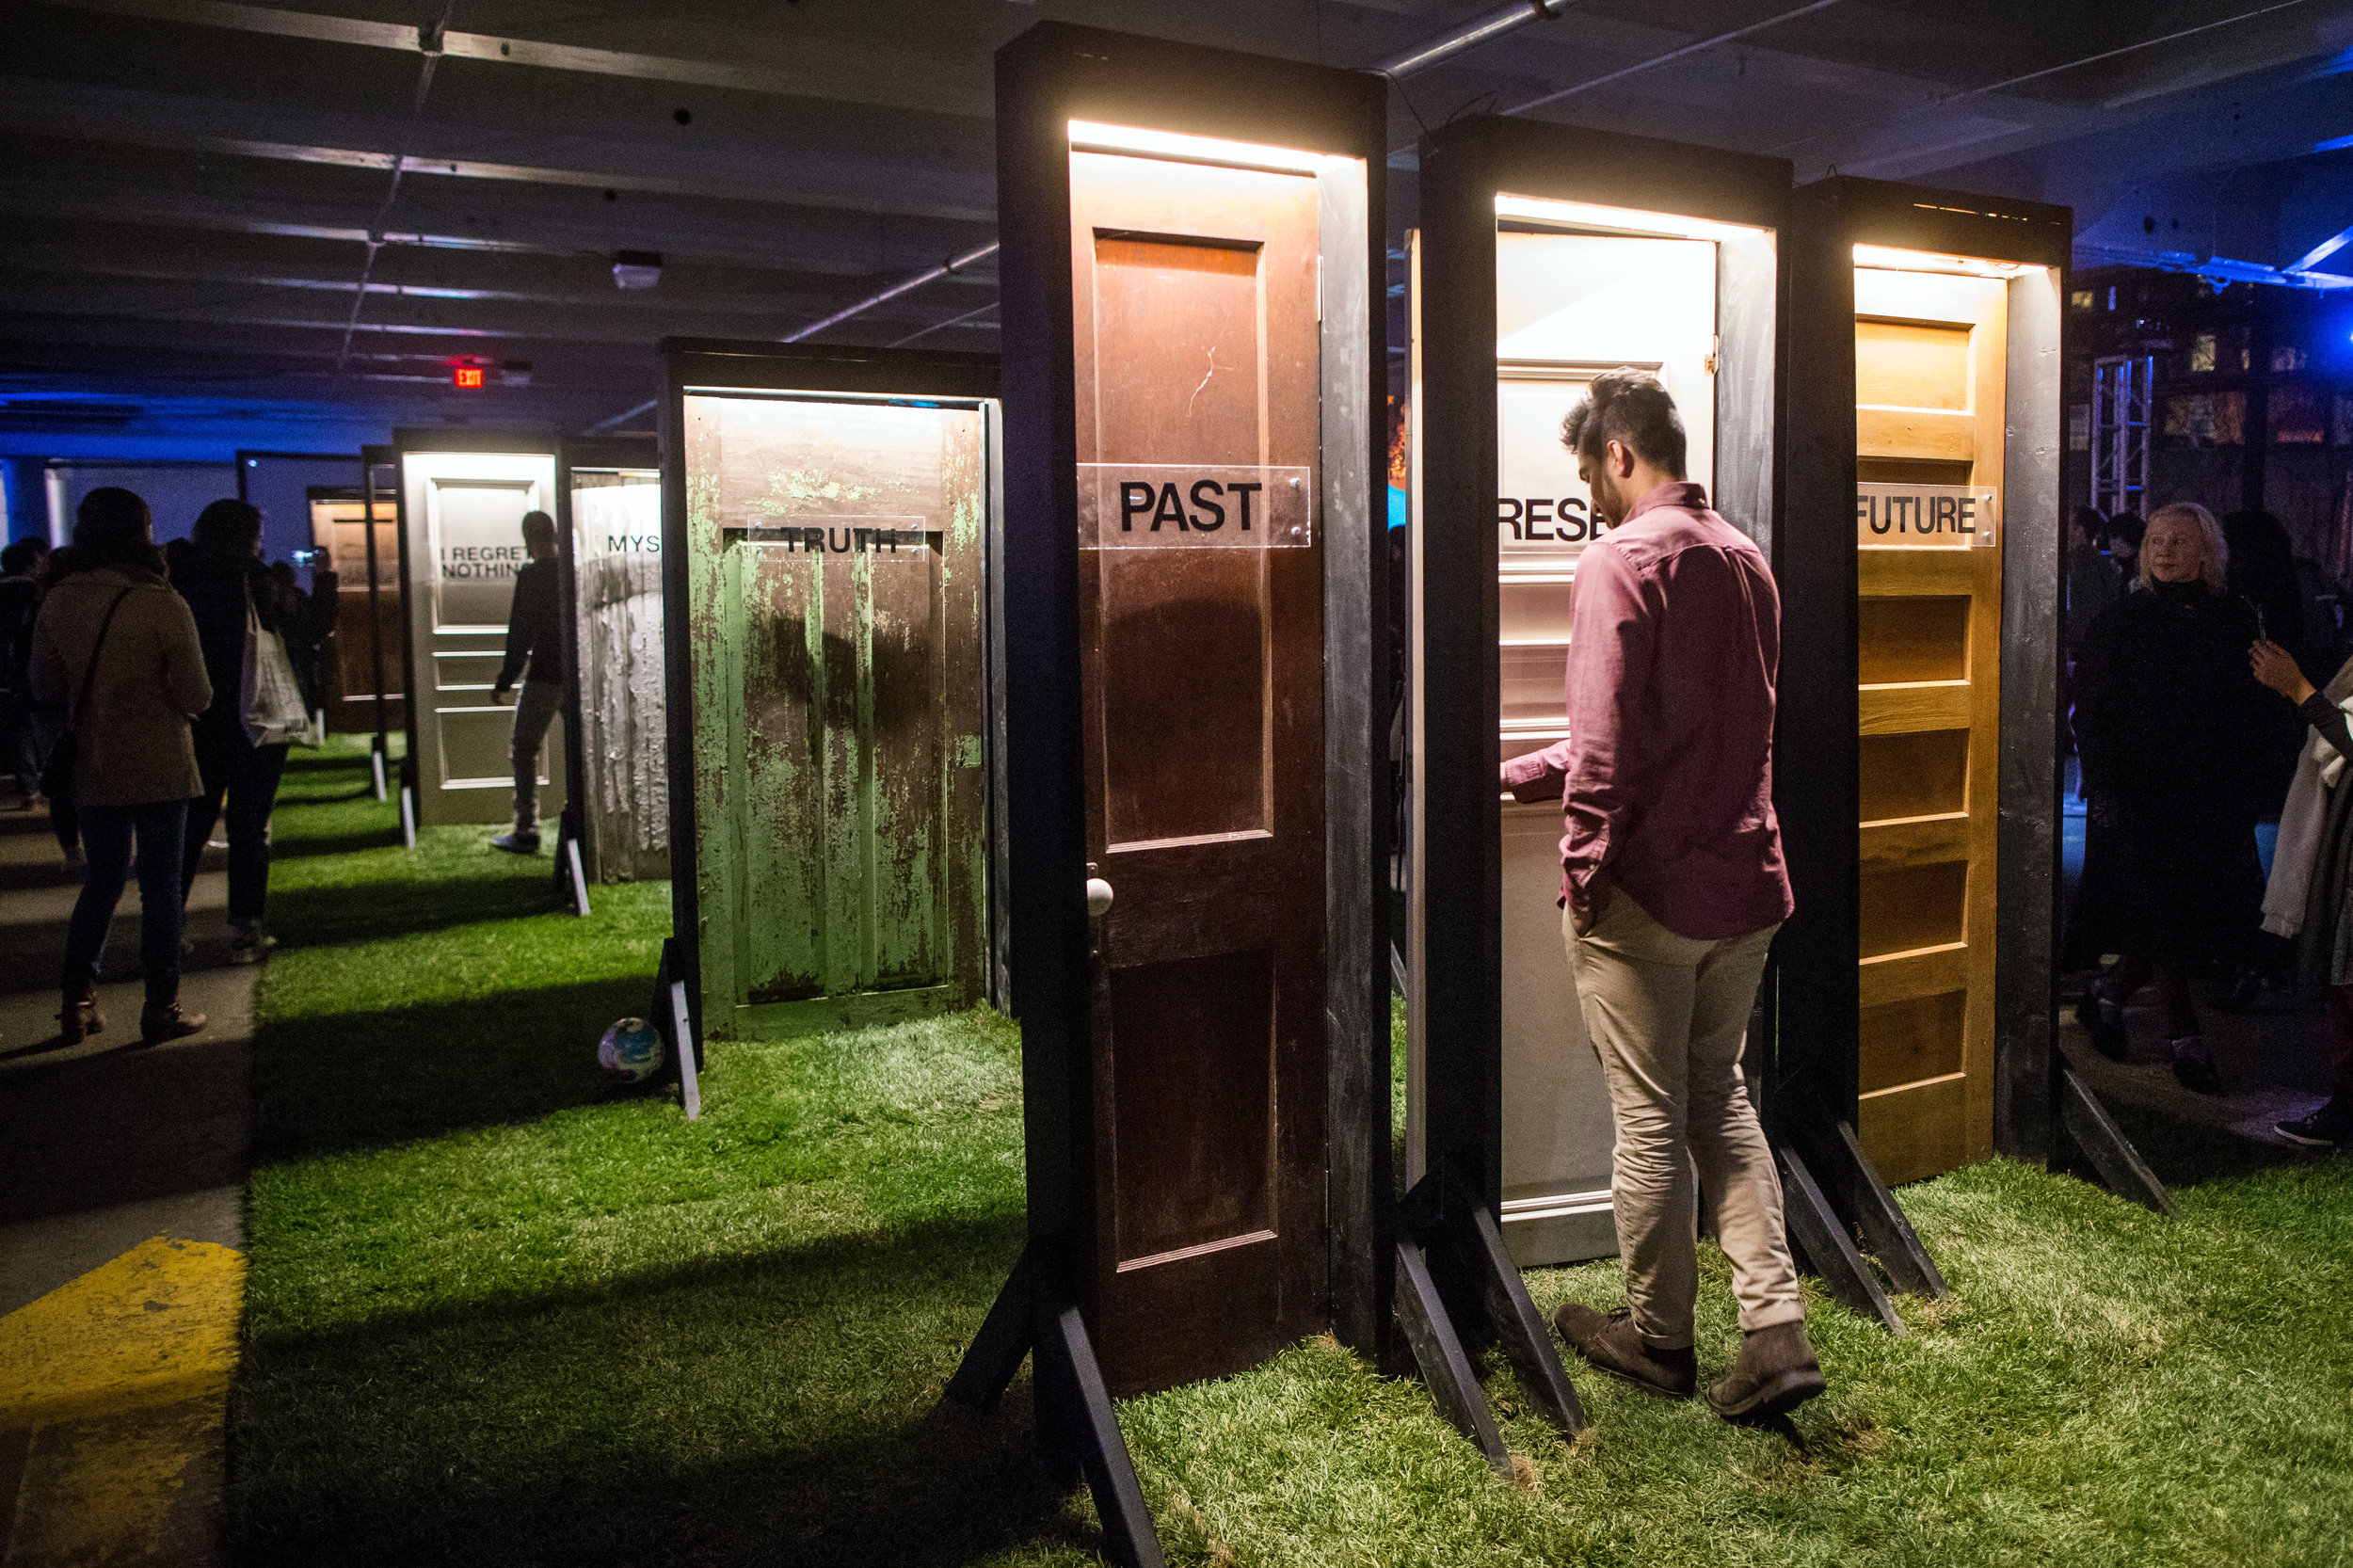 Between Doors_Labspace Studio (John Loerchner & Laura Mendes)_Illuminus 2015_Photo by Aram Boghosian_1.jpg